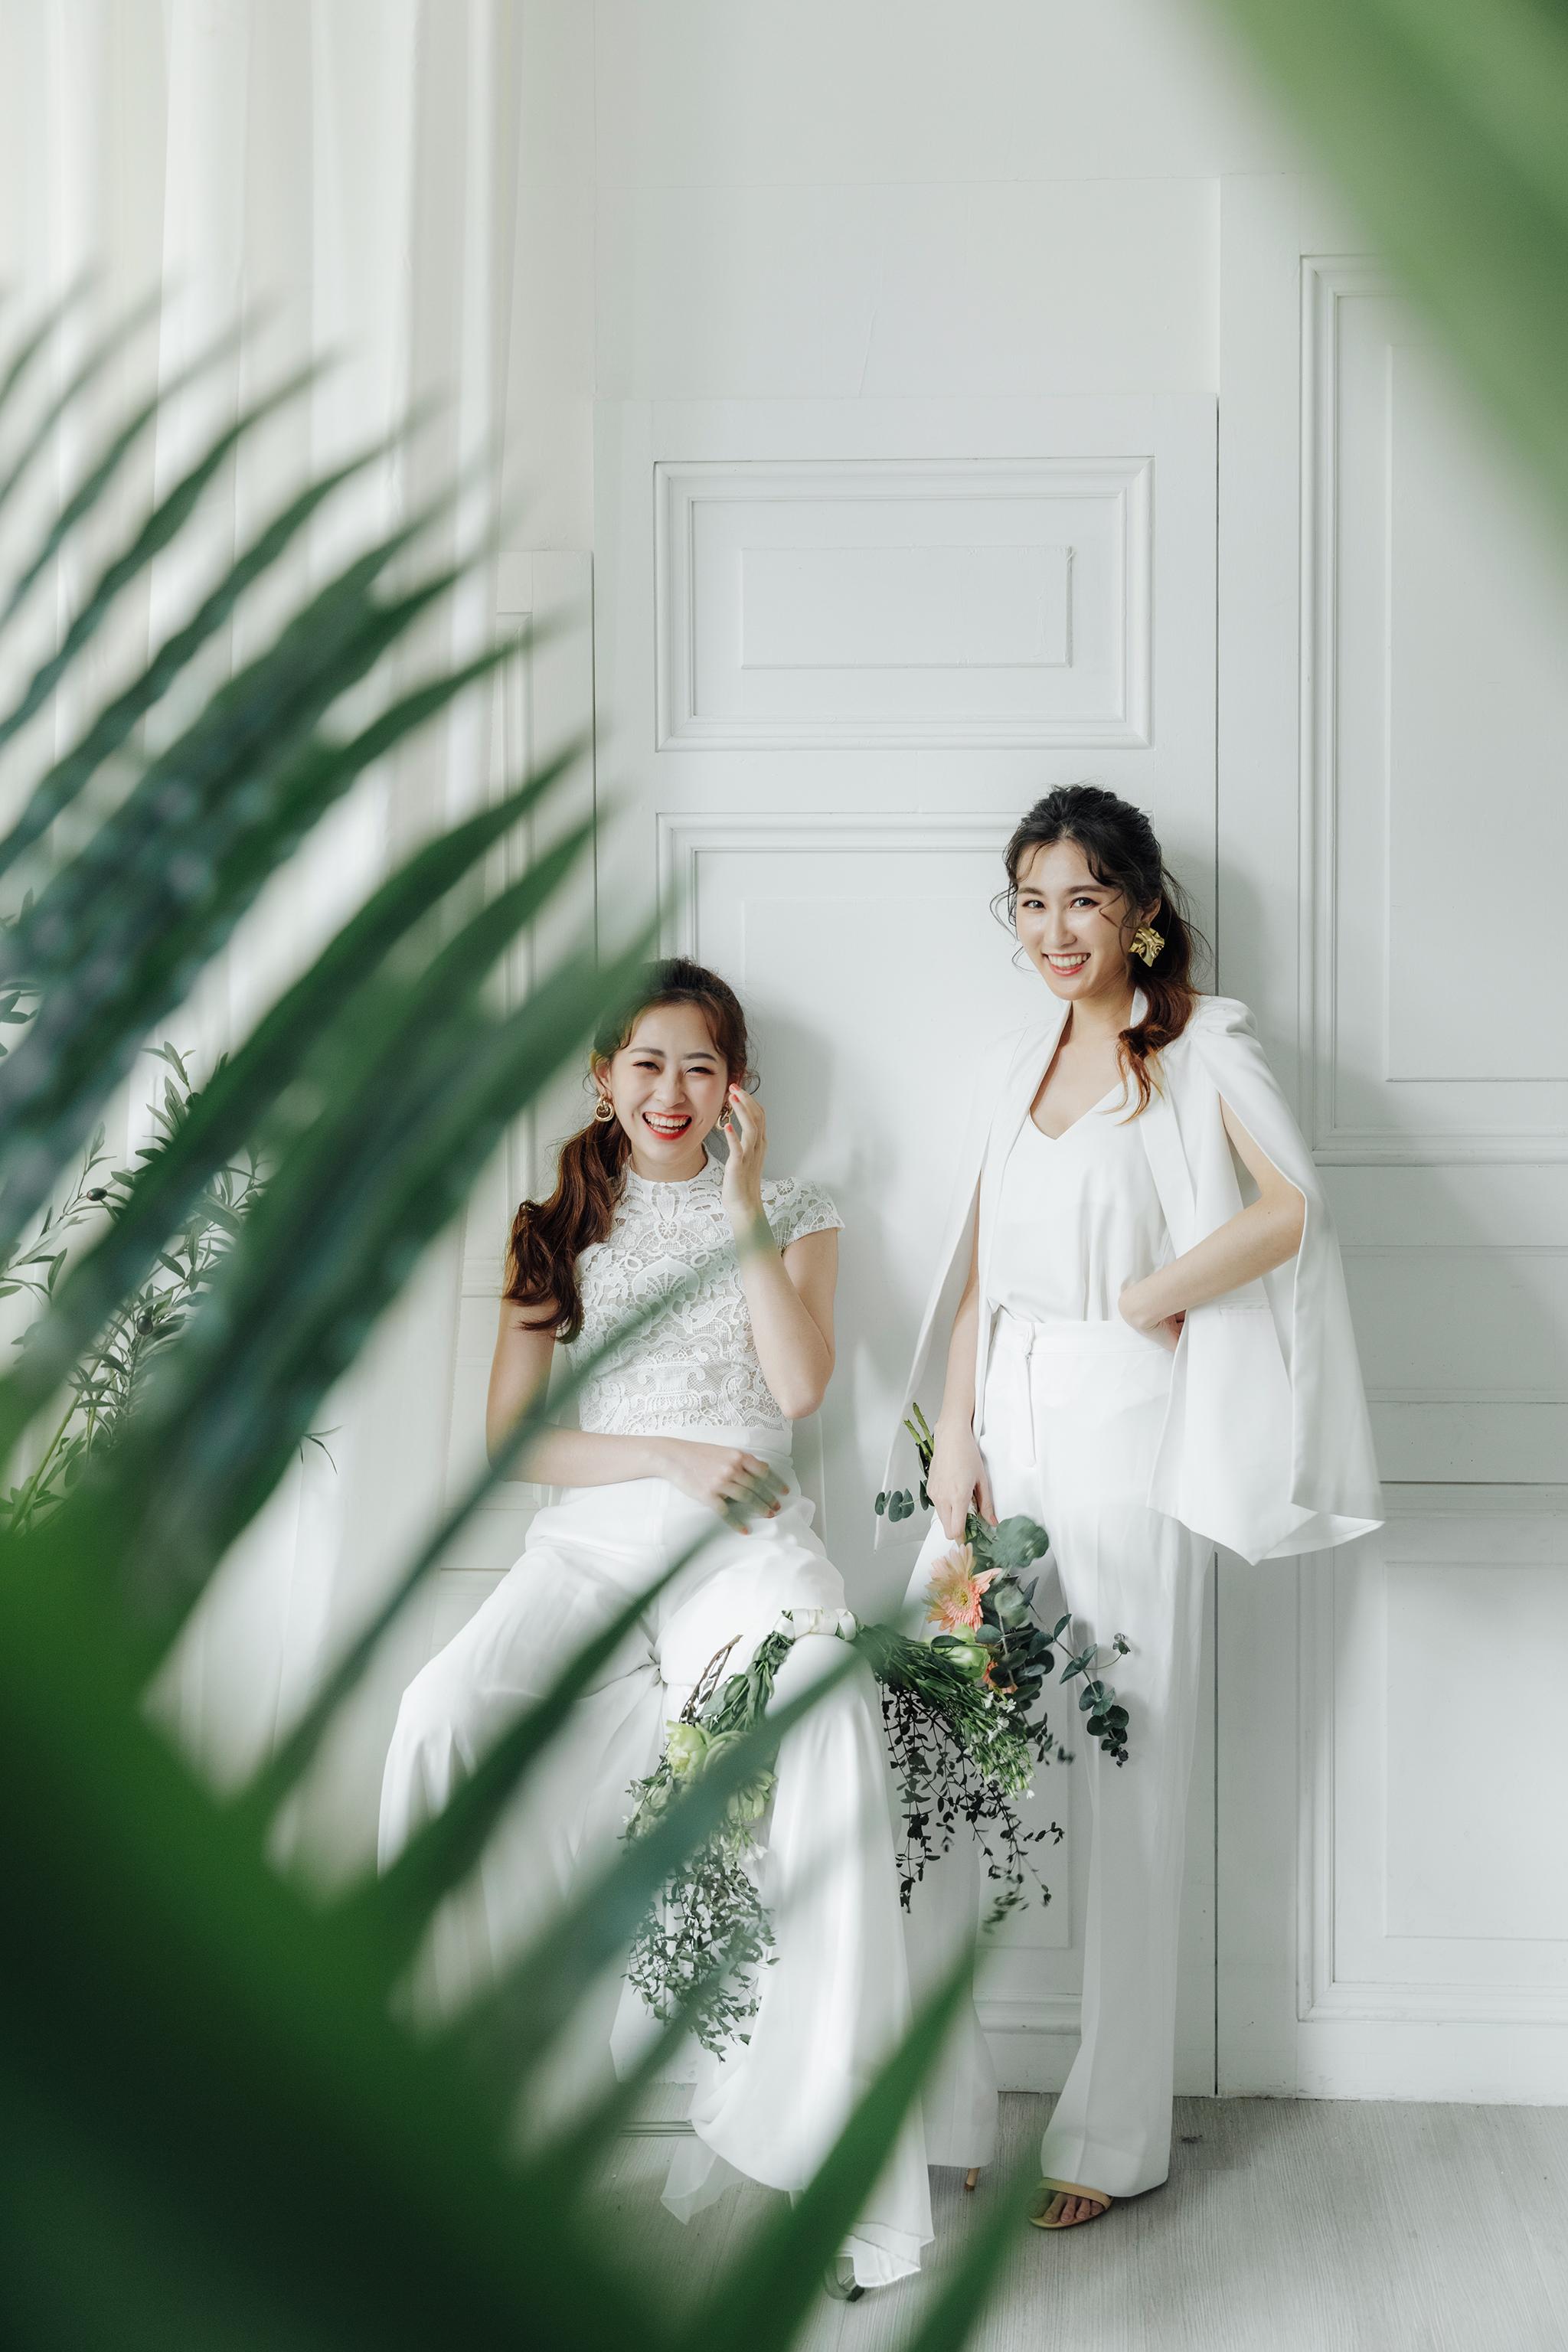 49929556047 7b15ec6d07 o - 【閨蜜婚紗】+Jessy & Tiffany+